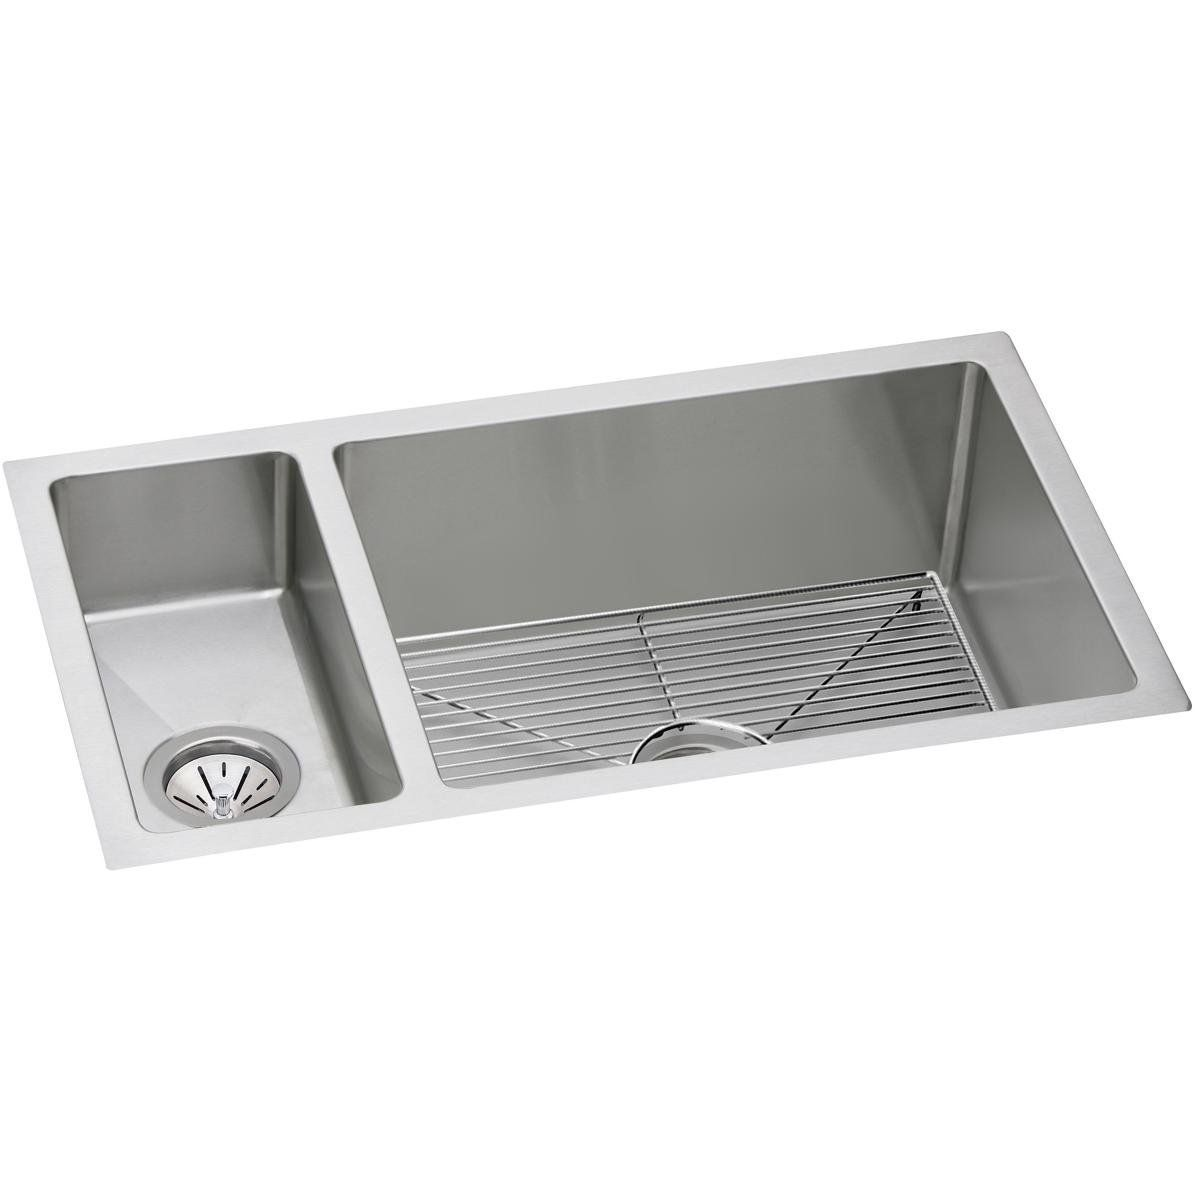 Elkay Crosstown Efru321910dbg 30 70 Double Bowl Undermount Stainless Steel Kitchen Sink Kit Amazon Com Elkay Sink Double Bowl Undermount Sink